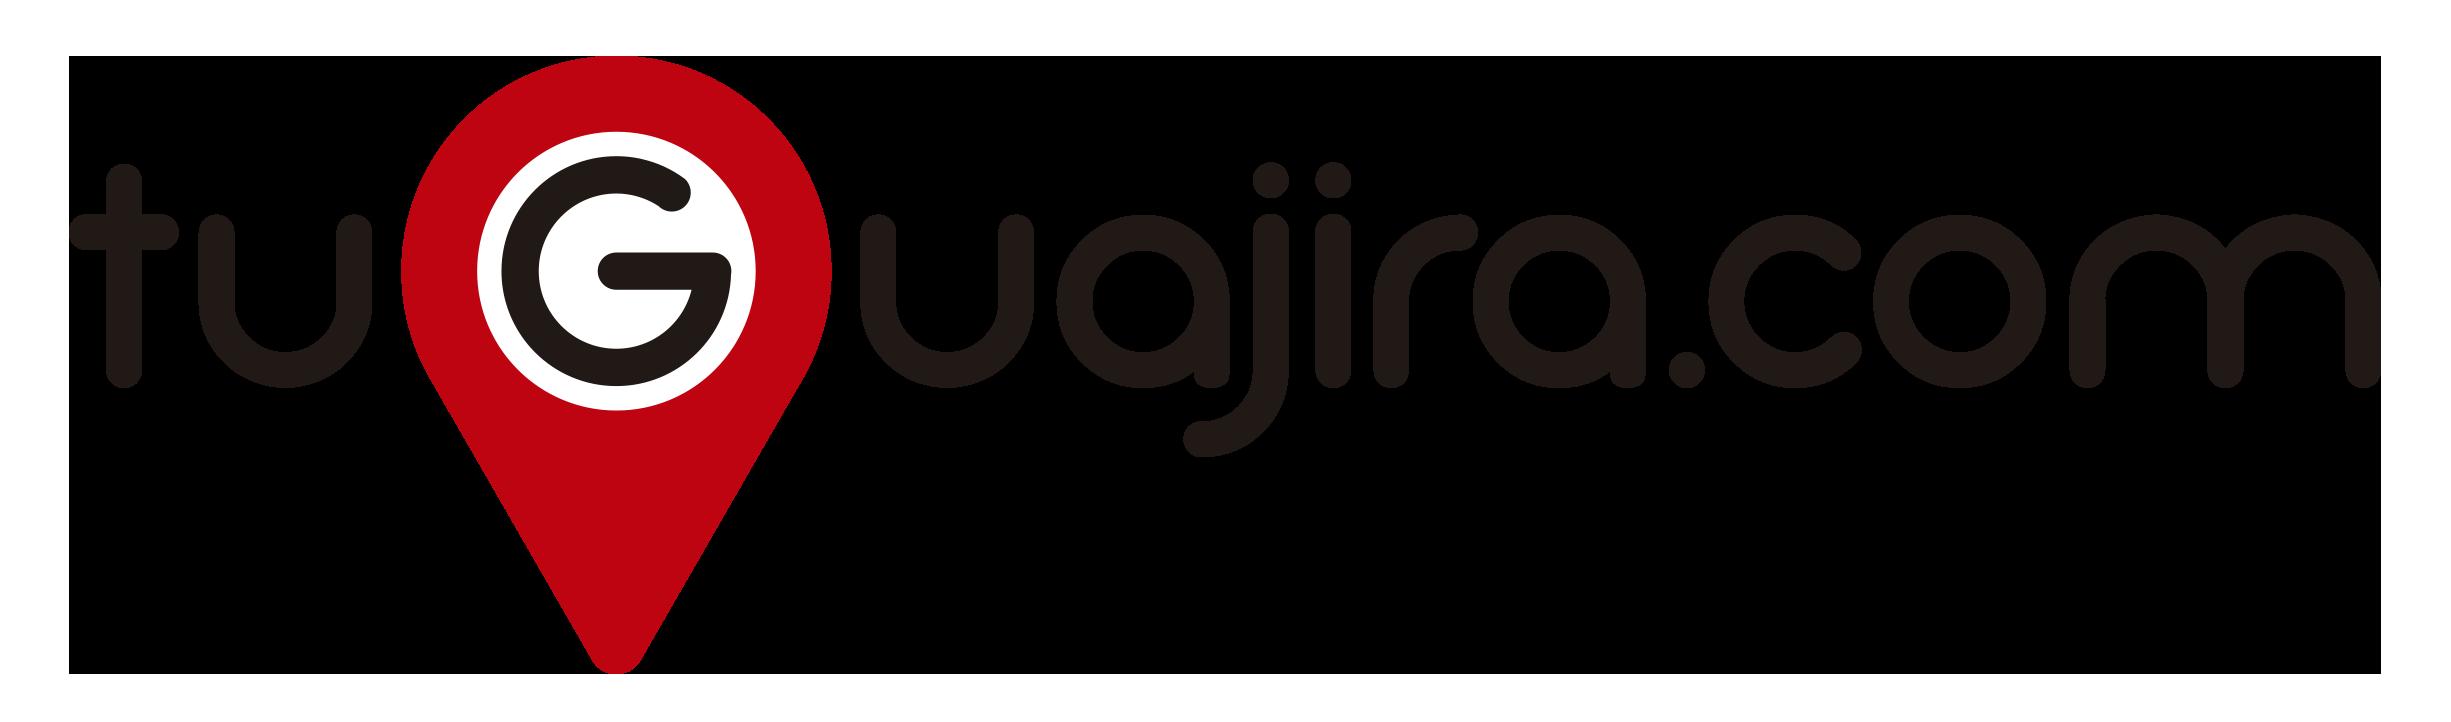 Tuguajira